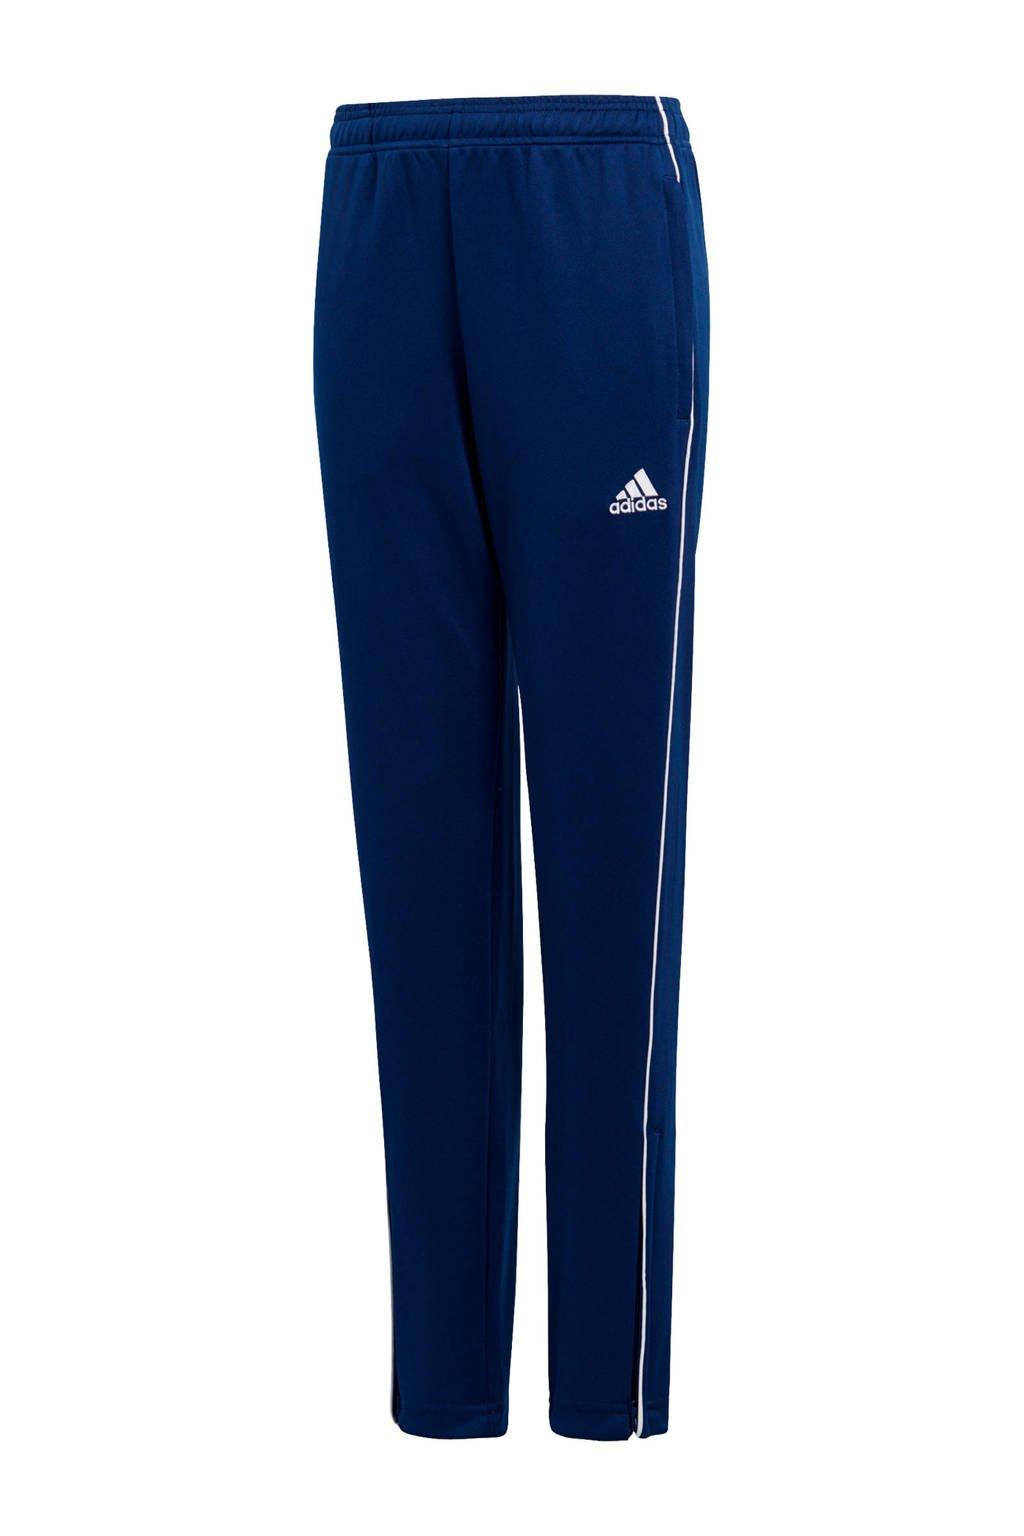 adidas Performance Junior  sportbroek Core 18 donkerblauw, Donkerblauw